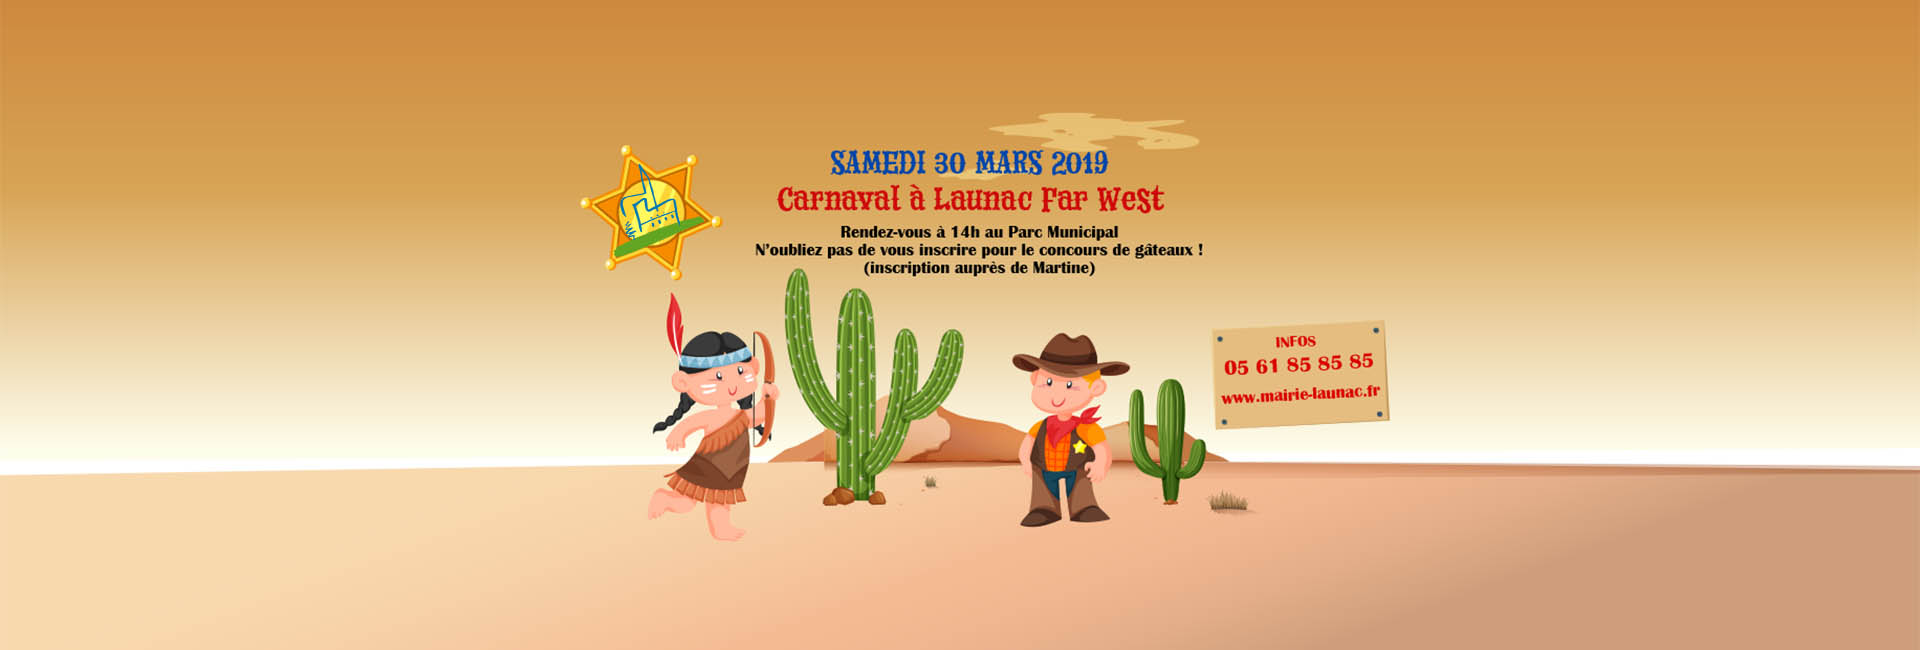 Slider Carnaval de Launac 30 Mars 2019